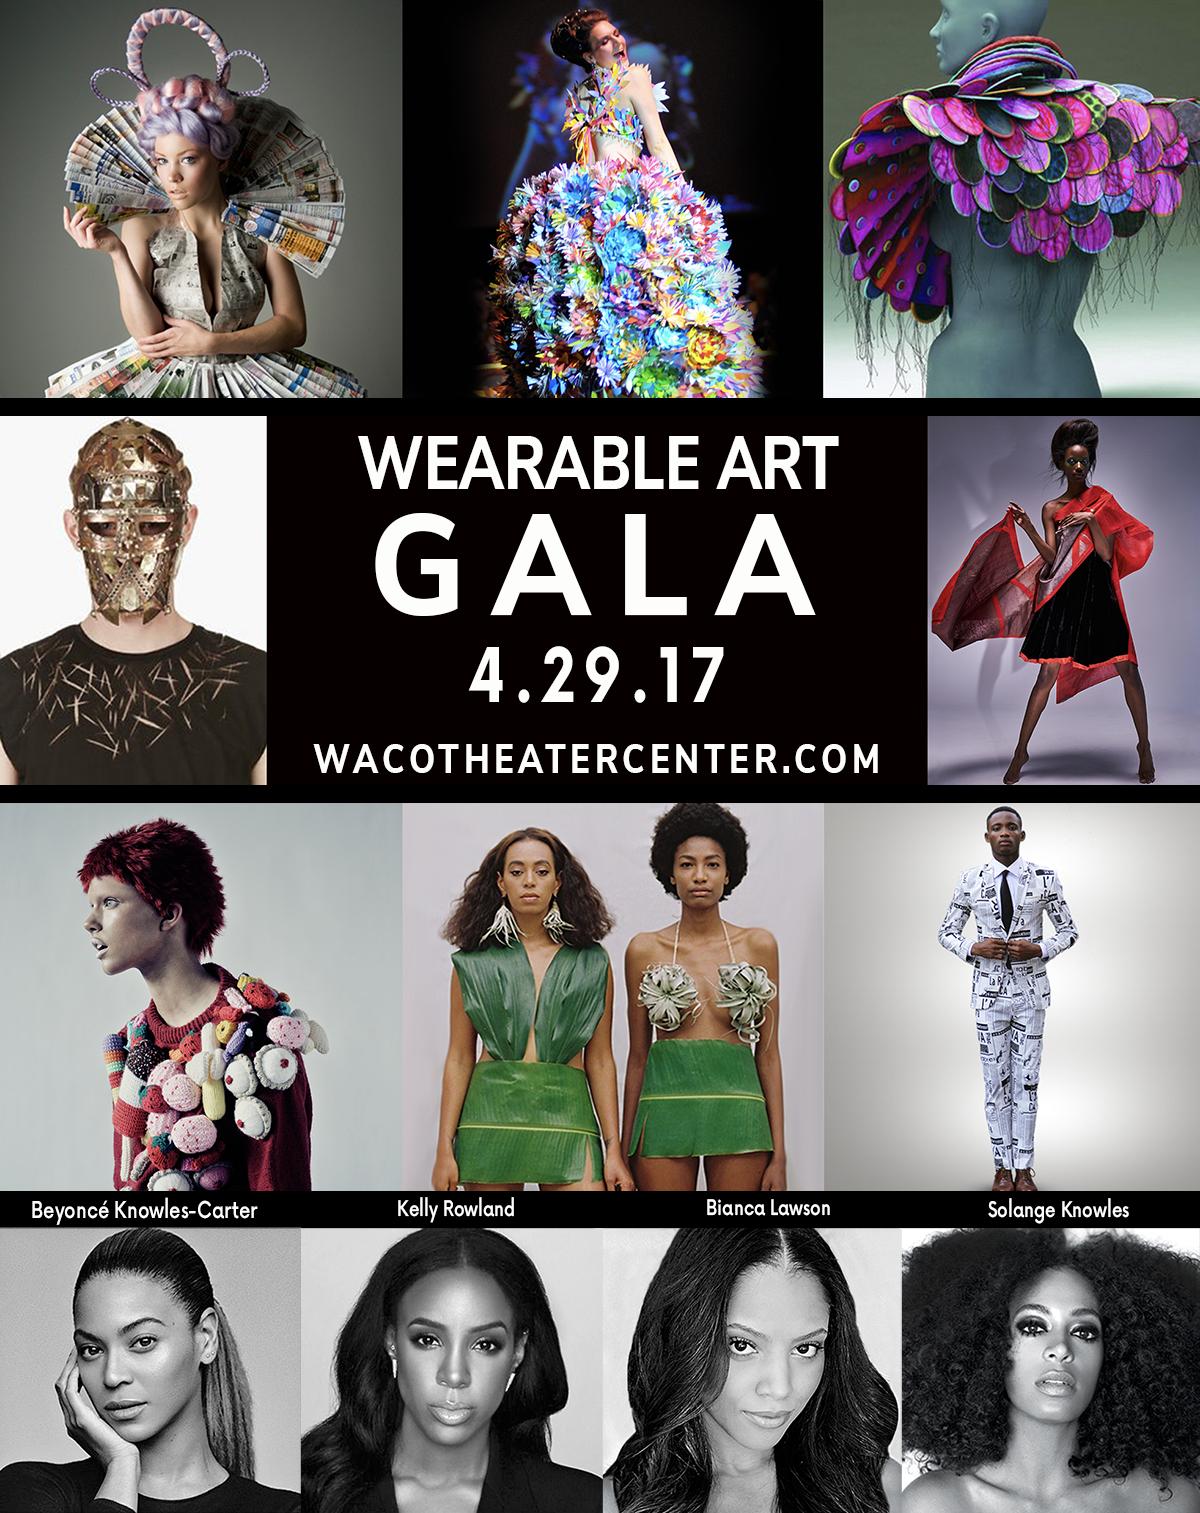 waco-wearable-art-gala-2017-cover